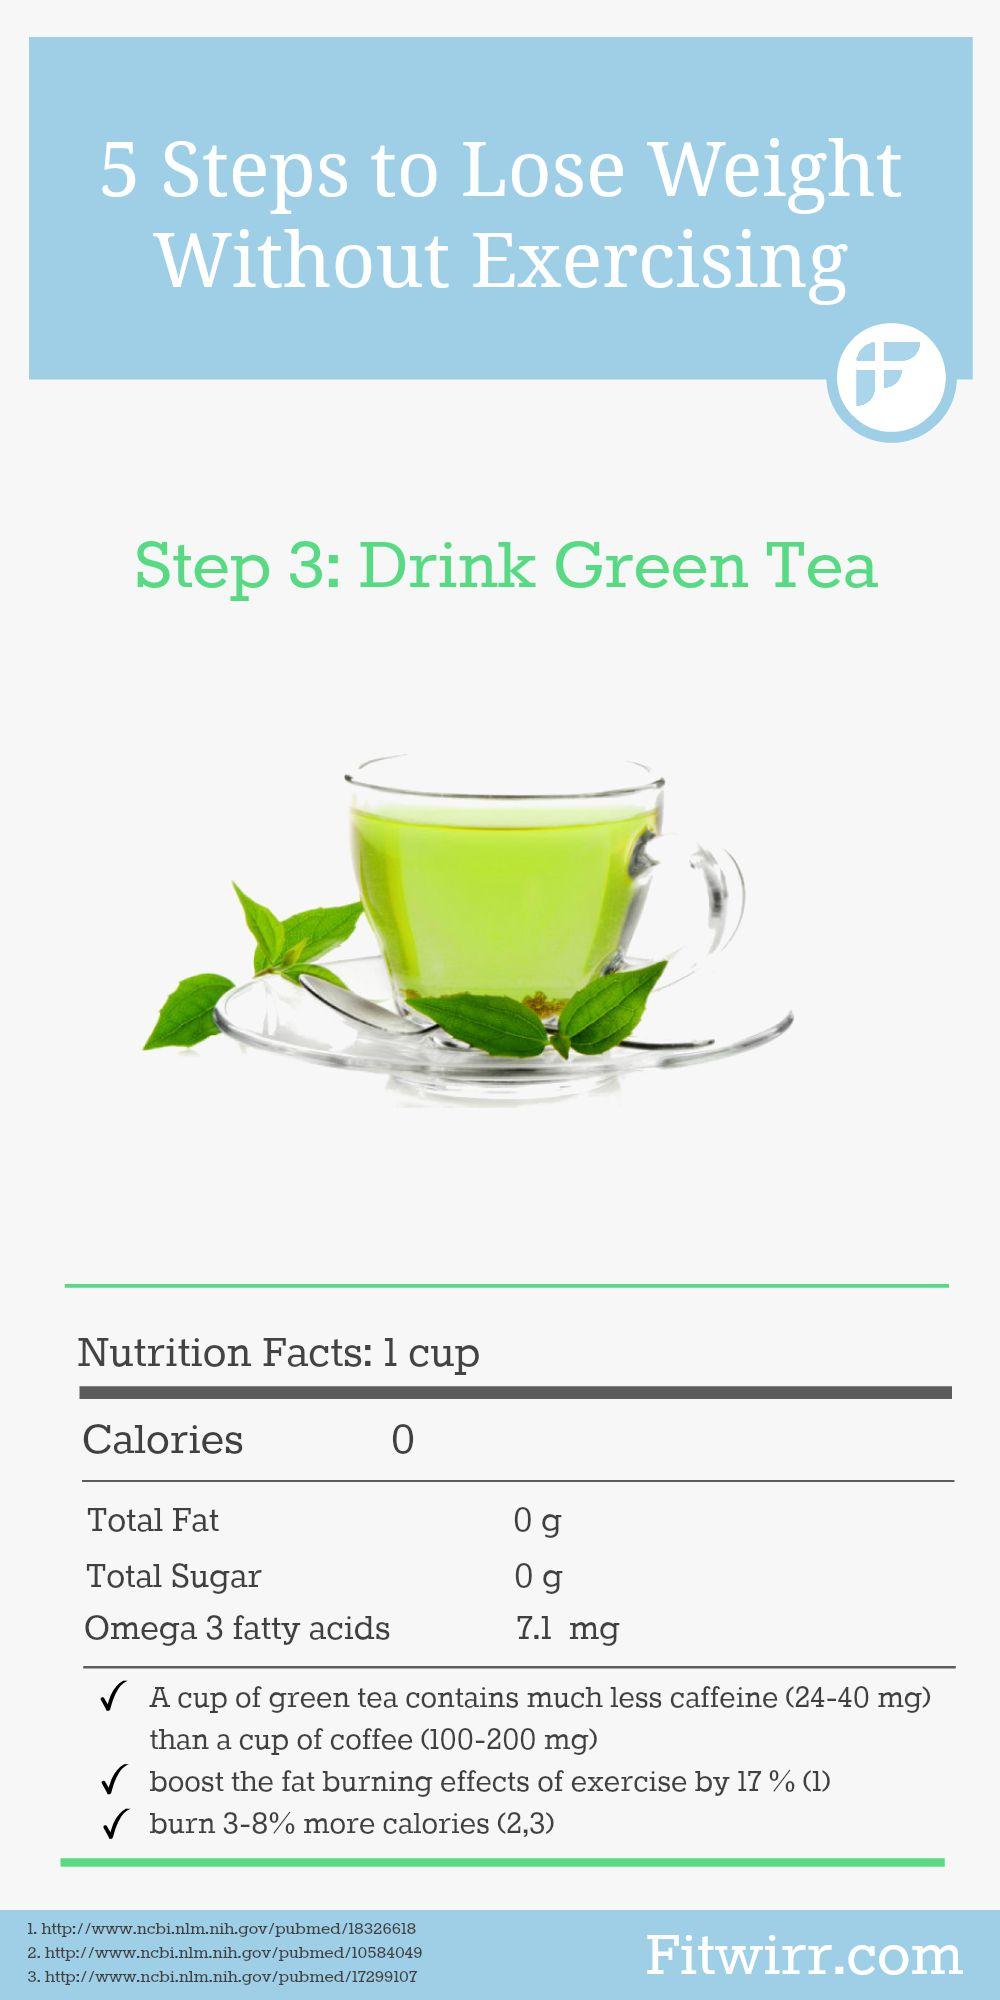 green tea lose weight 2 weeks photo - 1